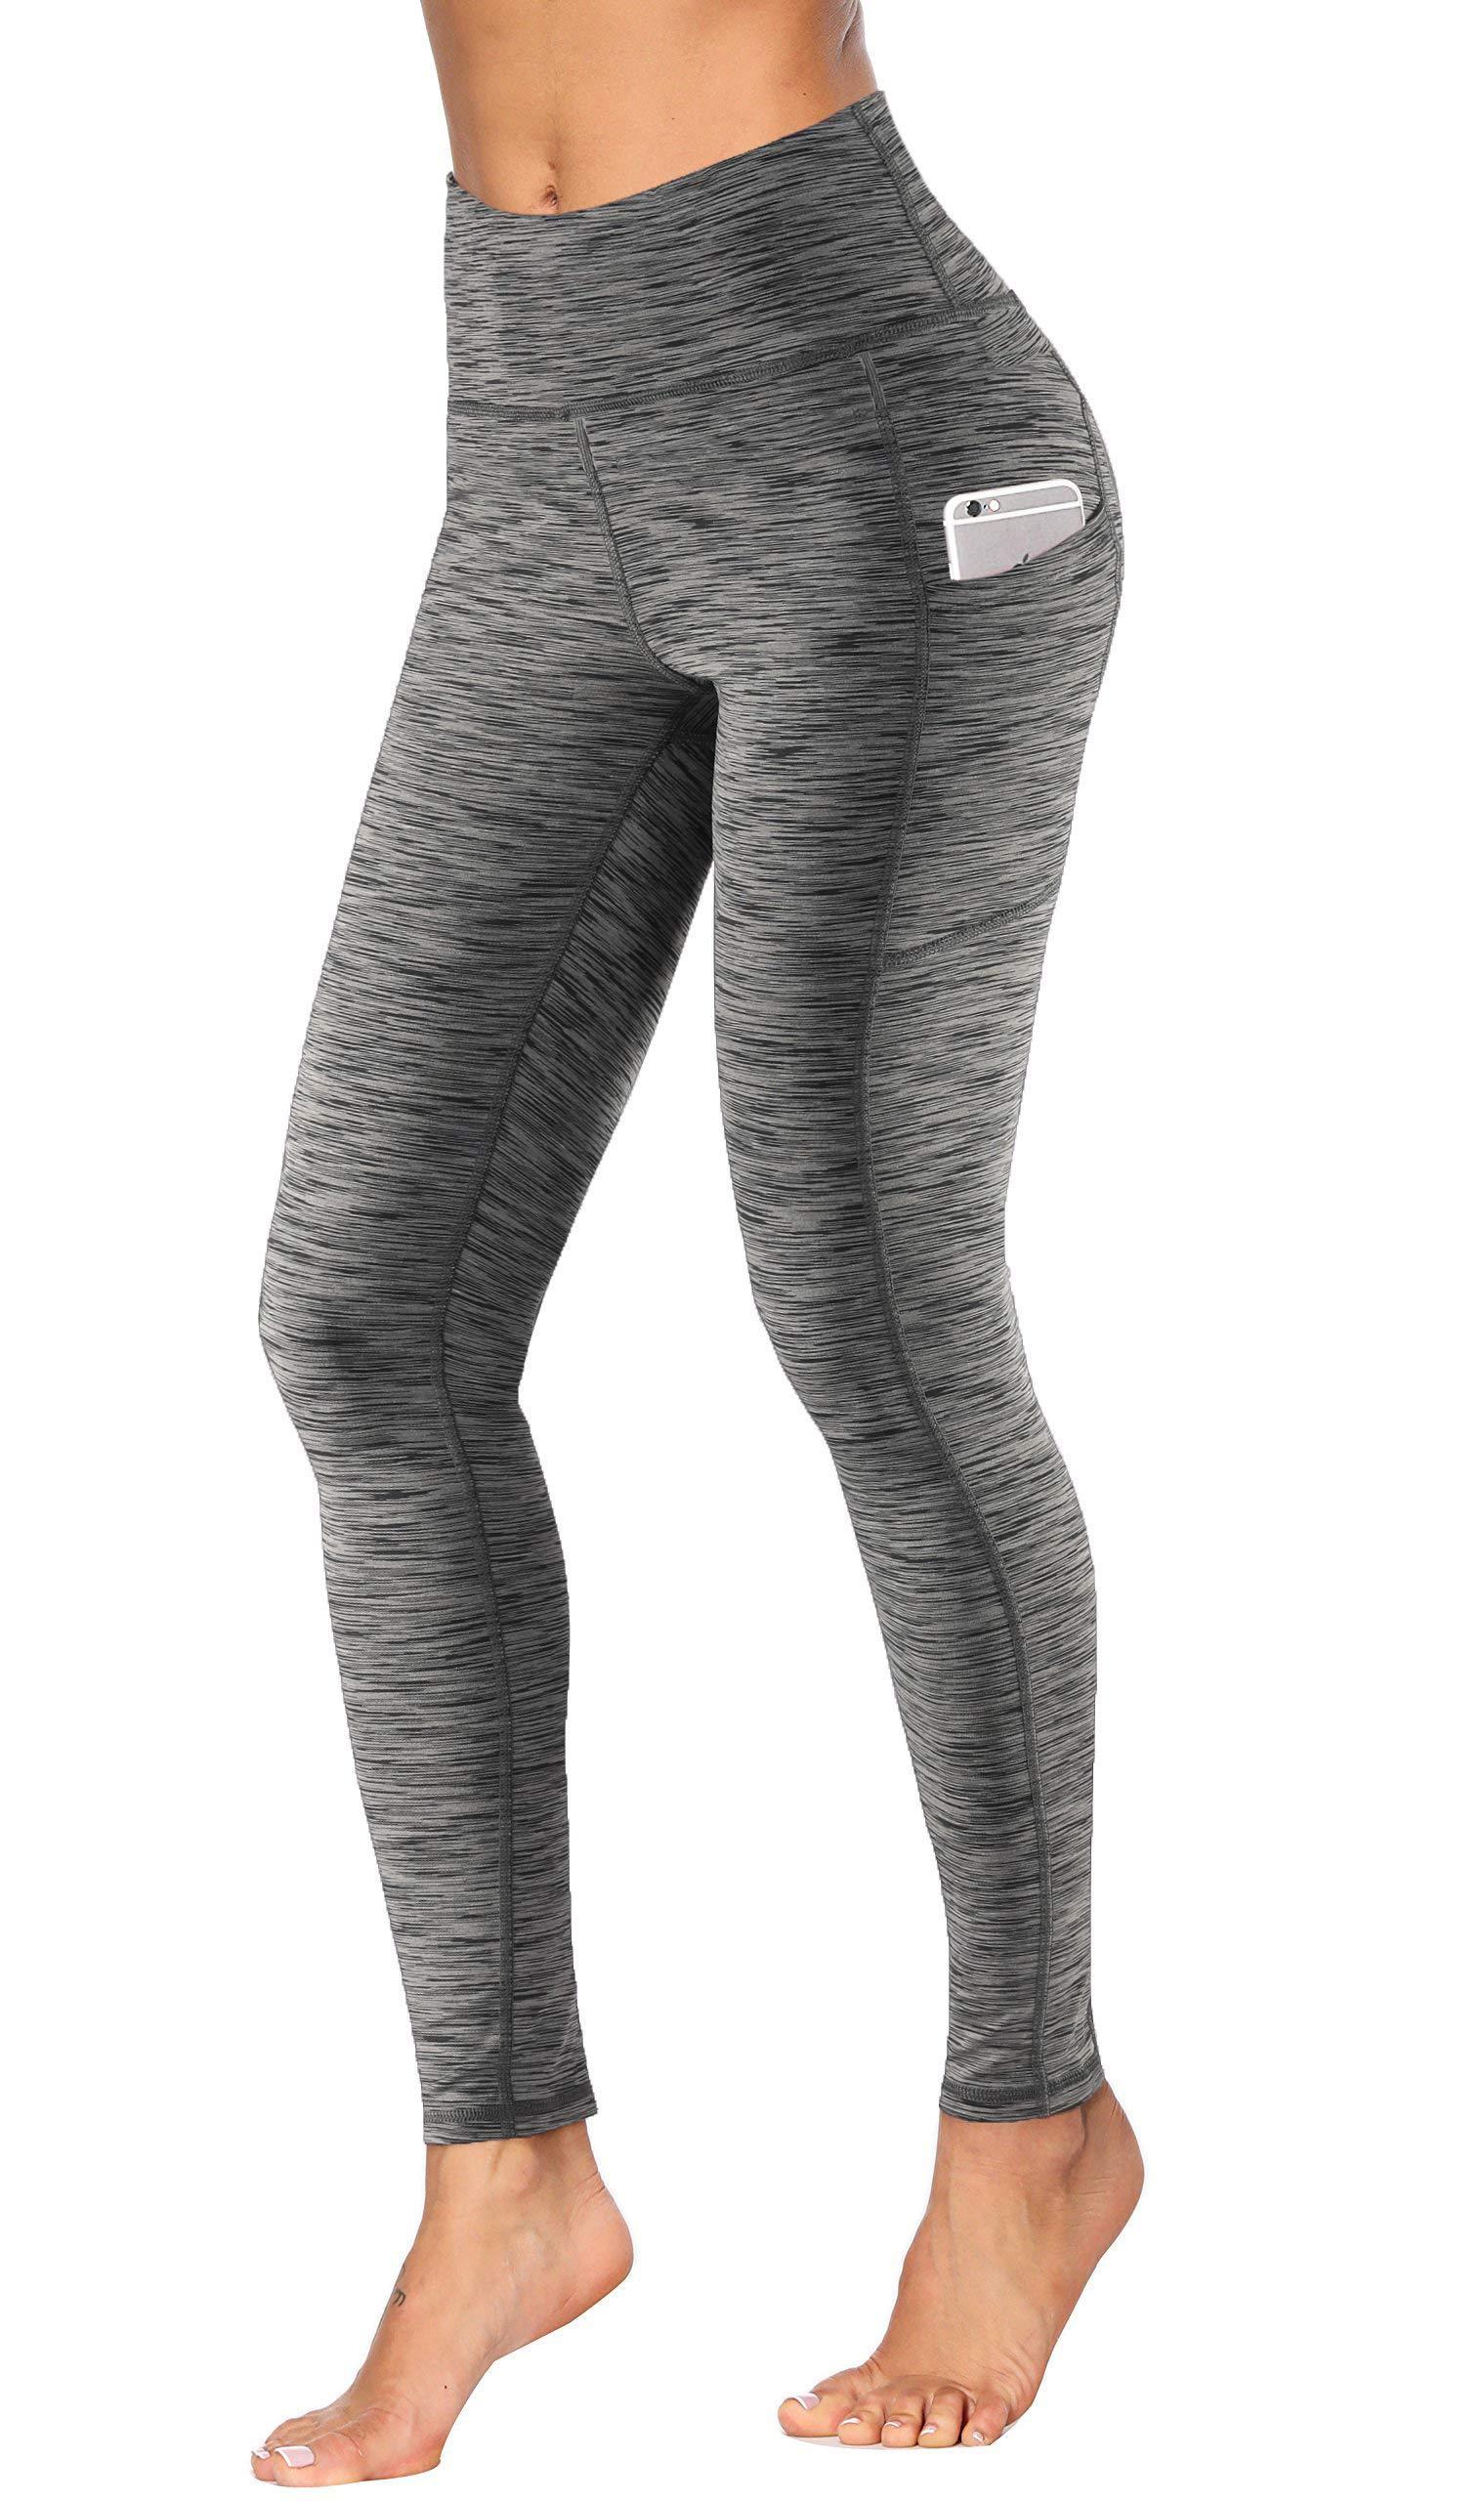 Fengbay High Waist Yoga Pants, Pocket Yoga Pants Tummy Control Workout Running 4 Way Stretch Yoga Leggings by Fengbay